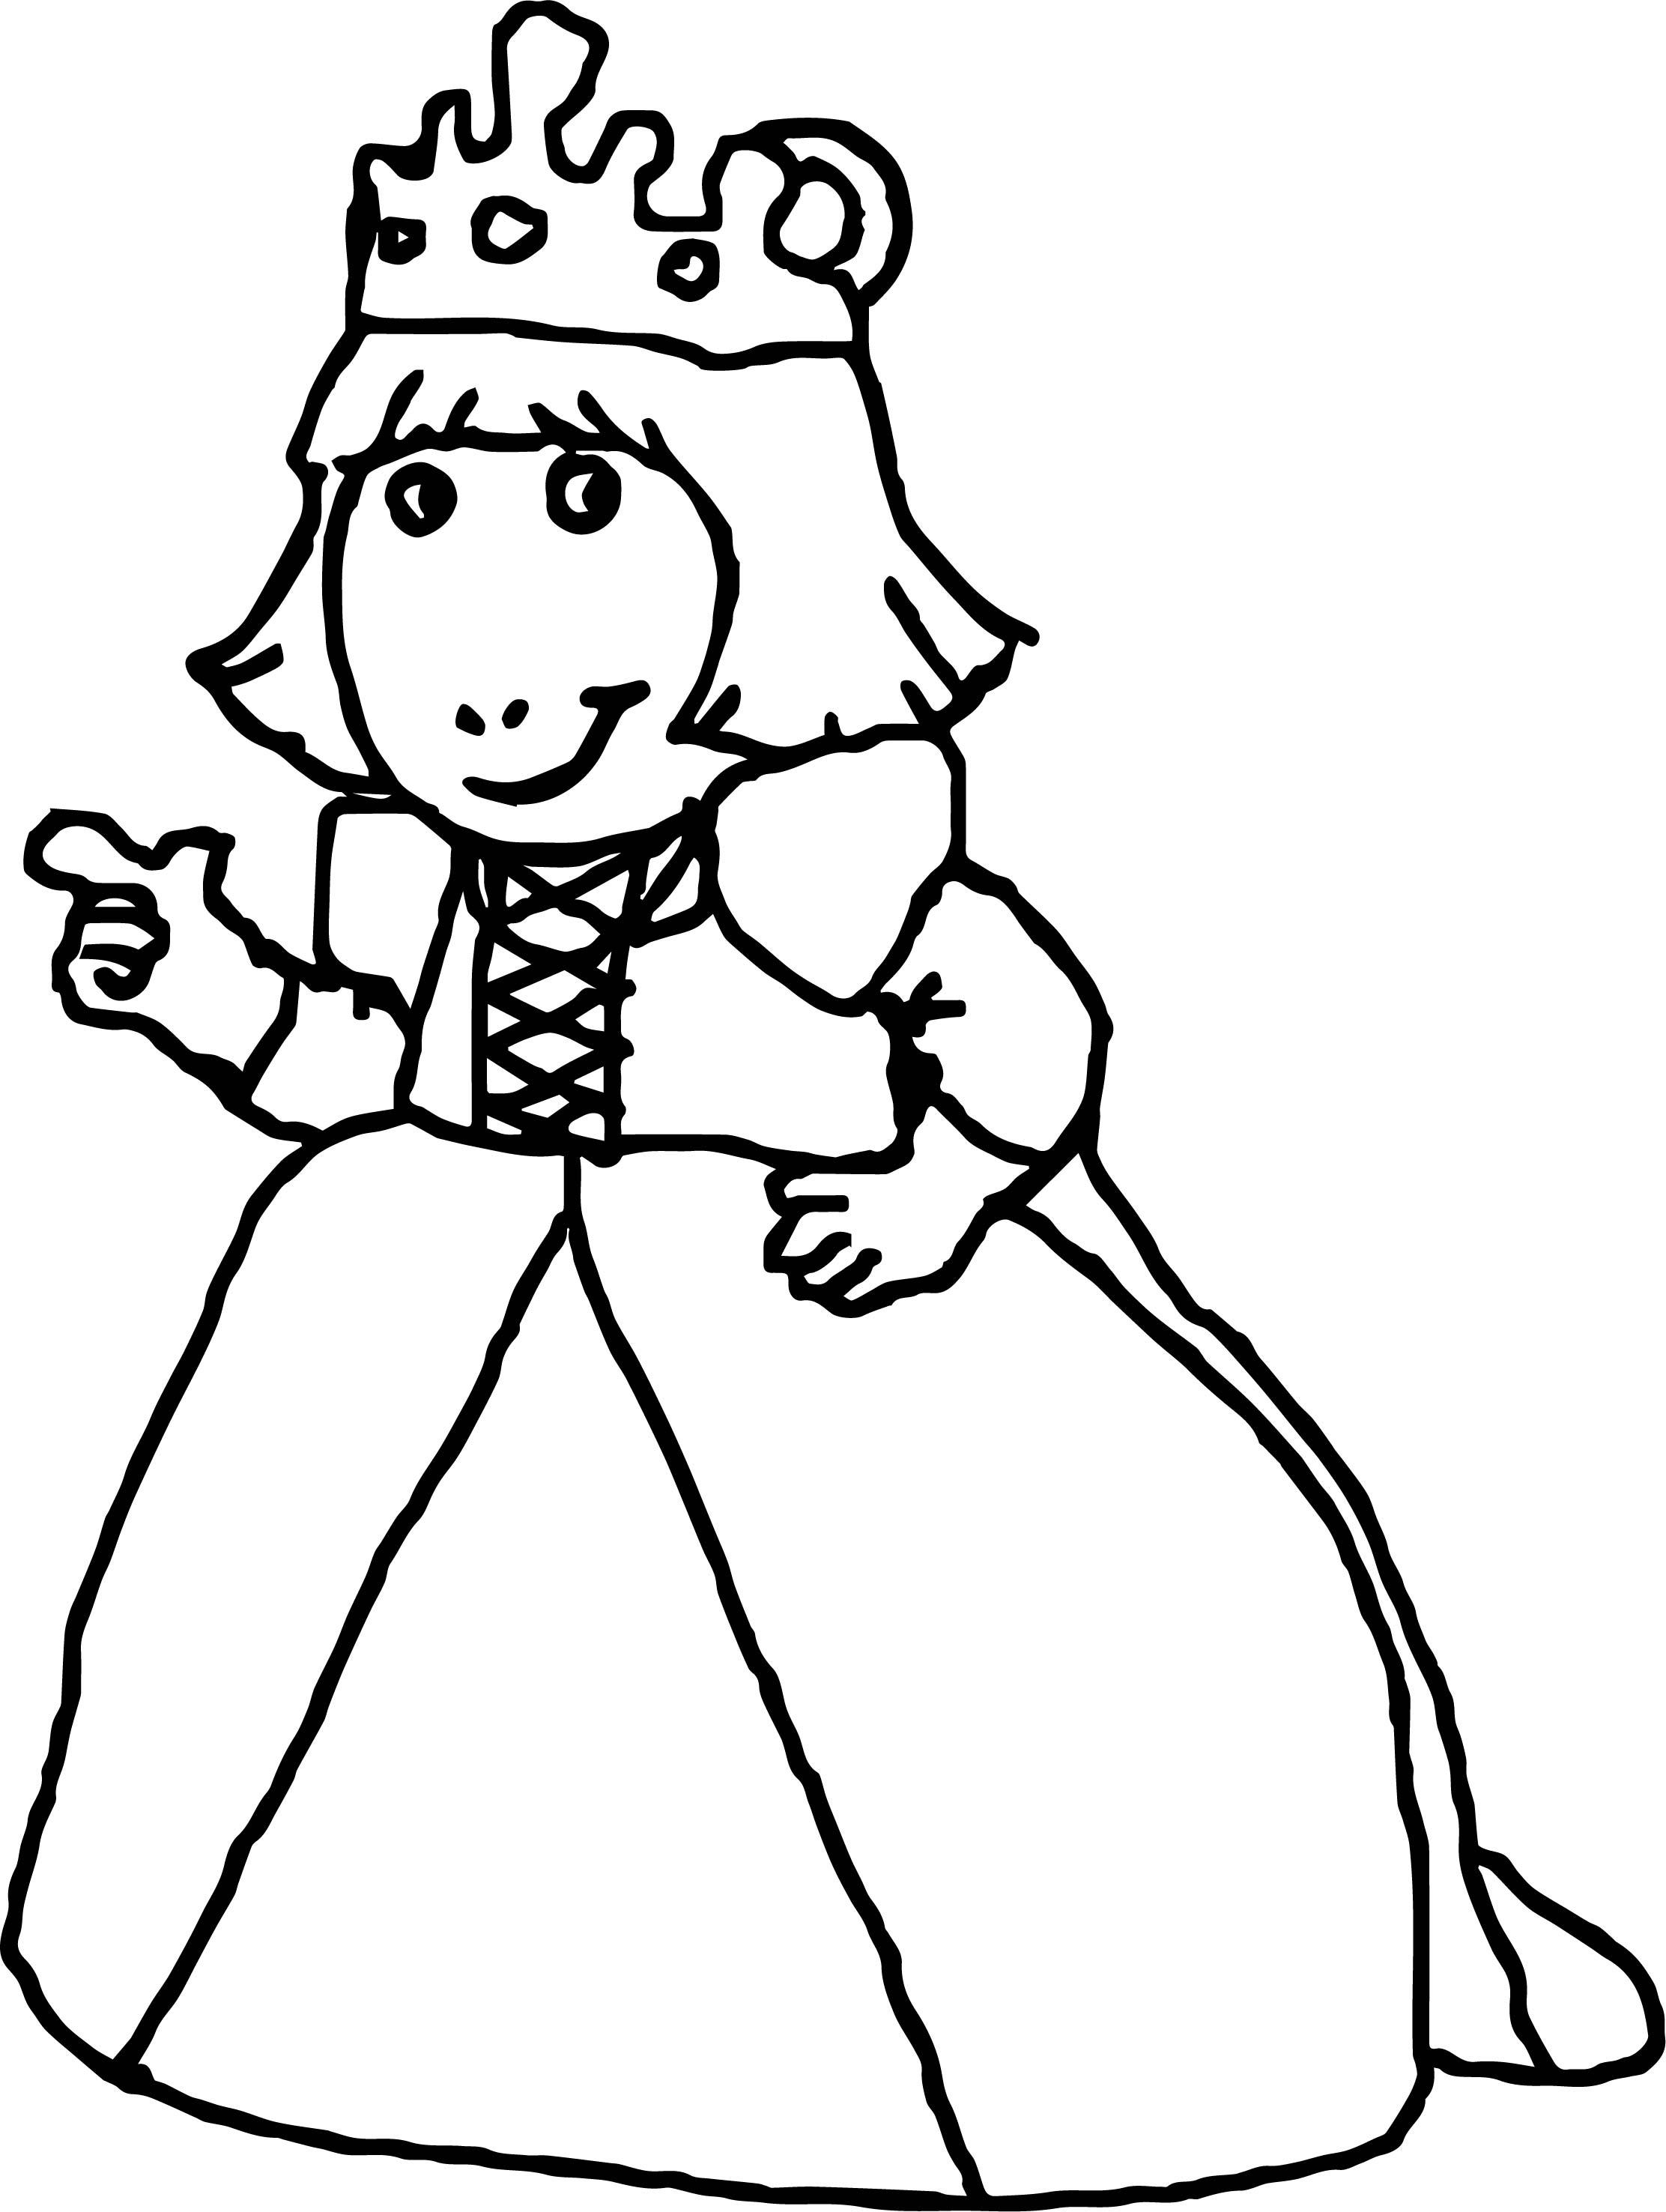 Princess Arthur Coloring Page Wecoloringpage Com